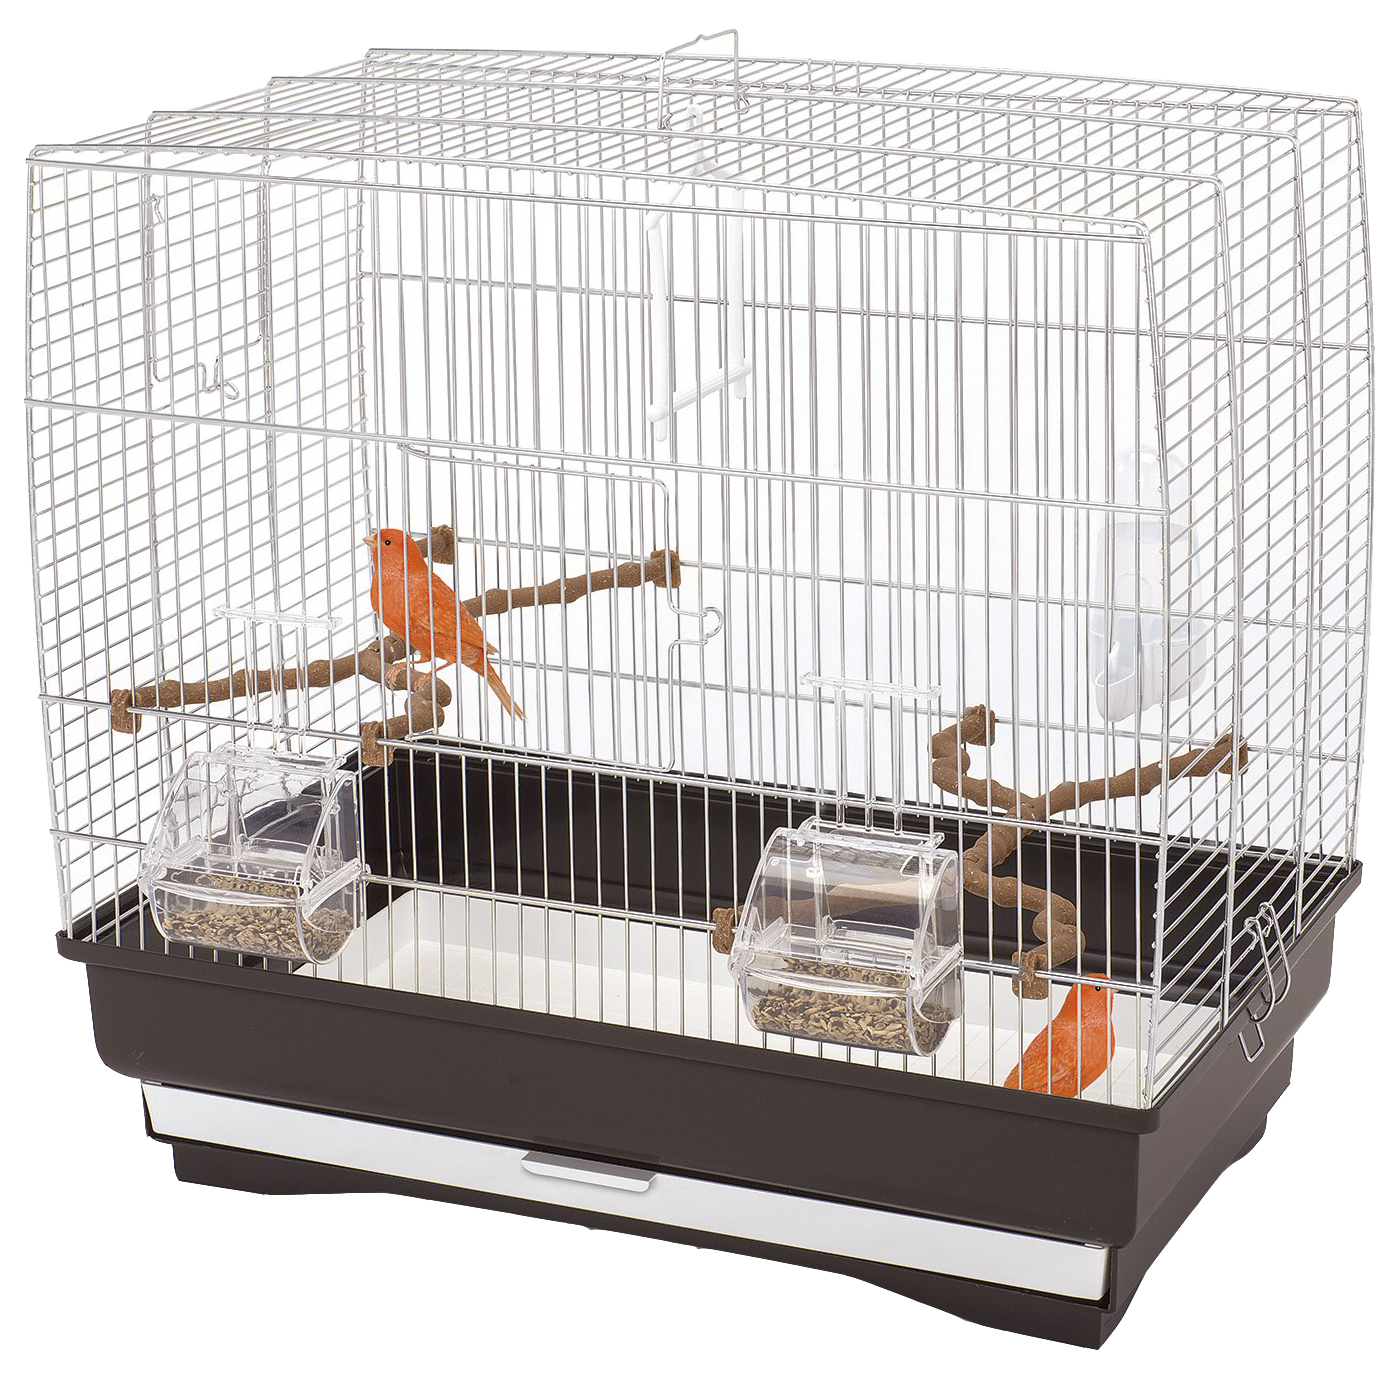 Клетка для птиц IMAC Irene 3 коричневая